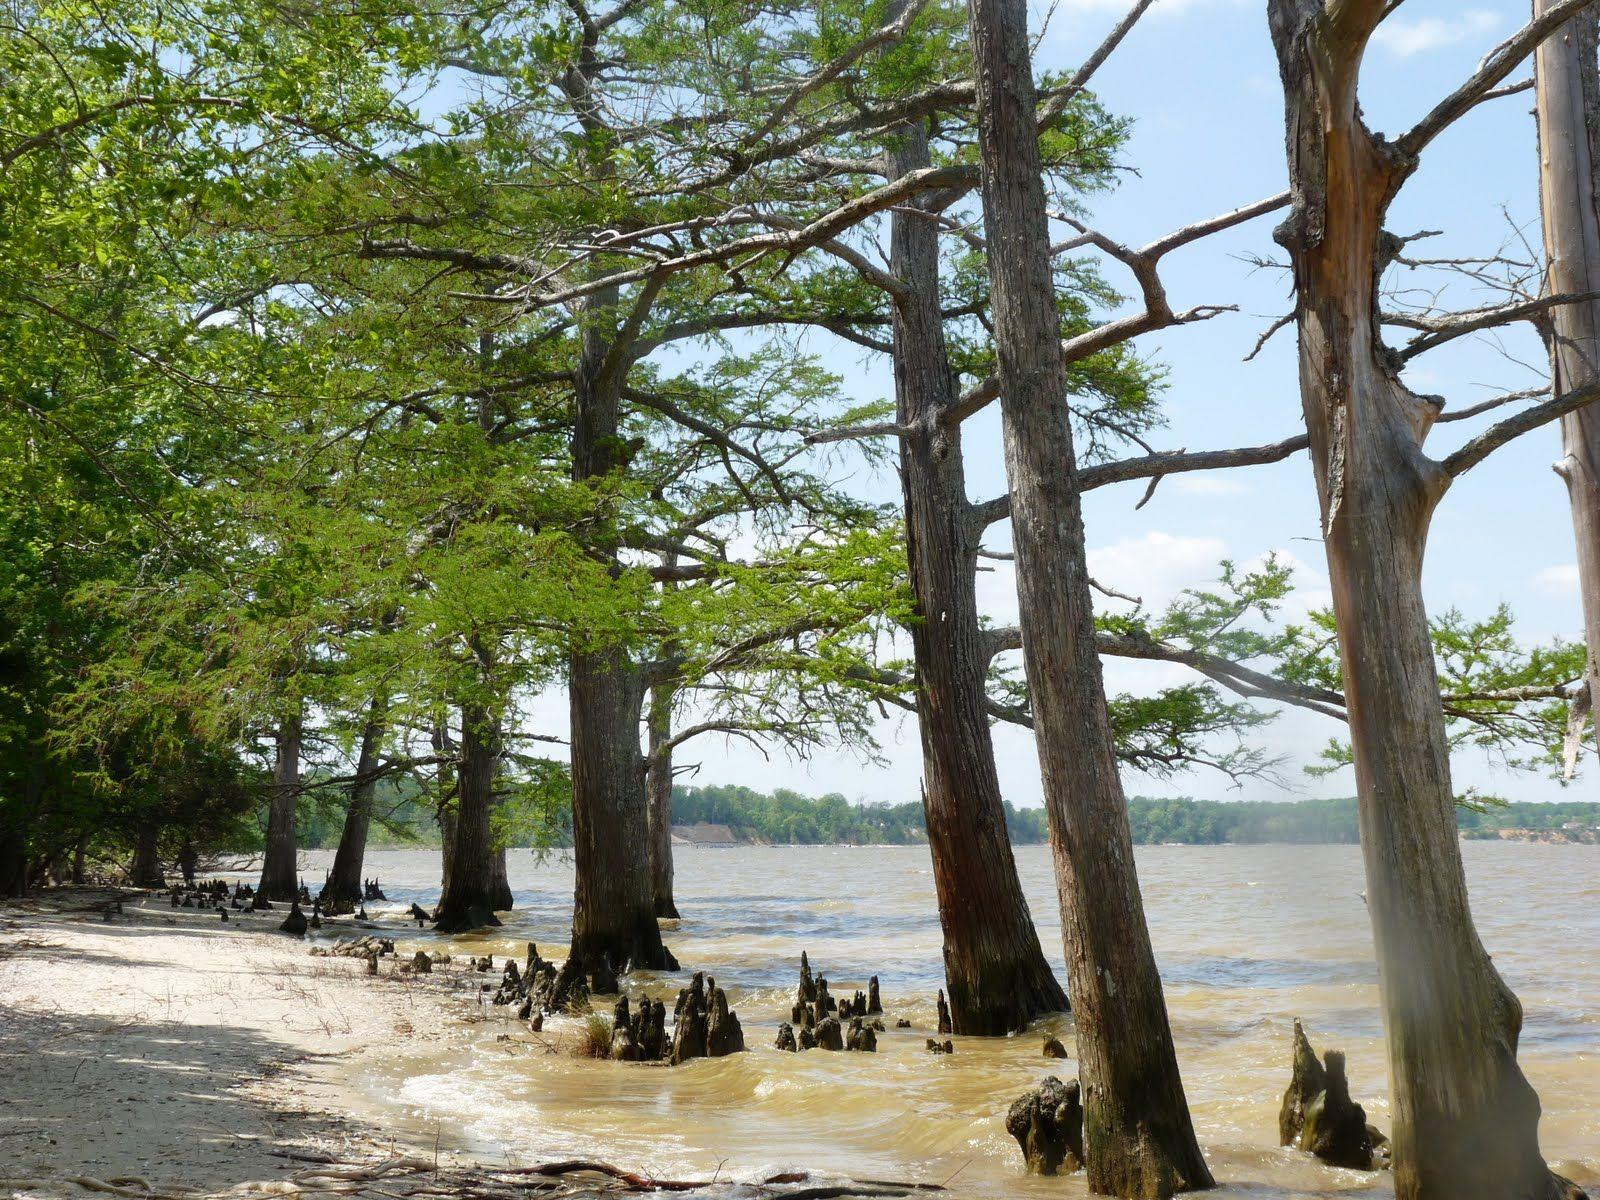 Beach Chippokes Plantation State Park. Surry Va. Haven